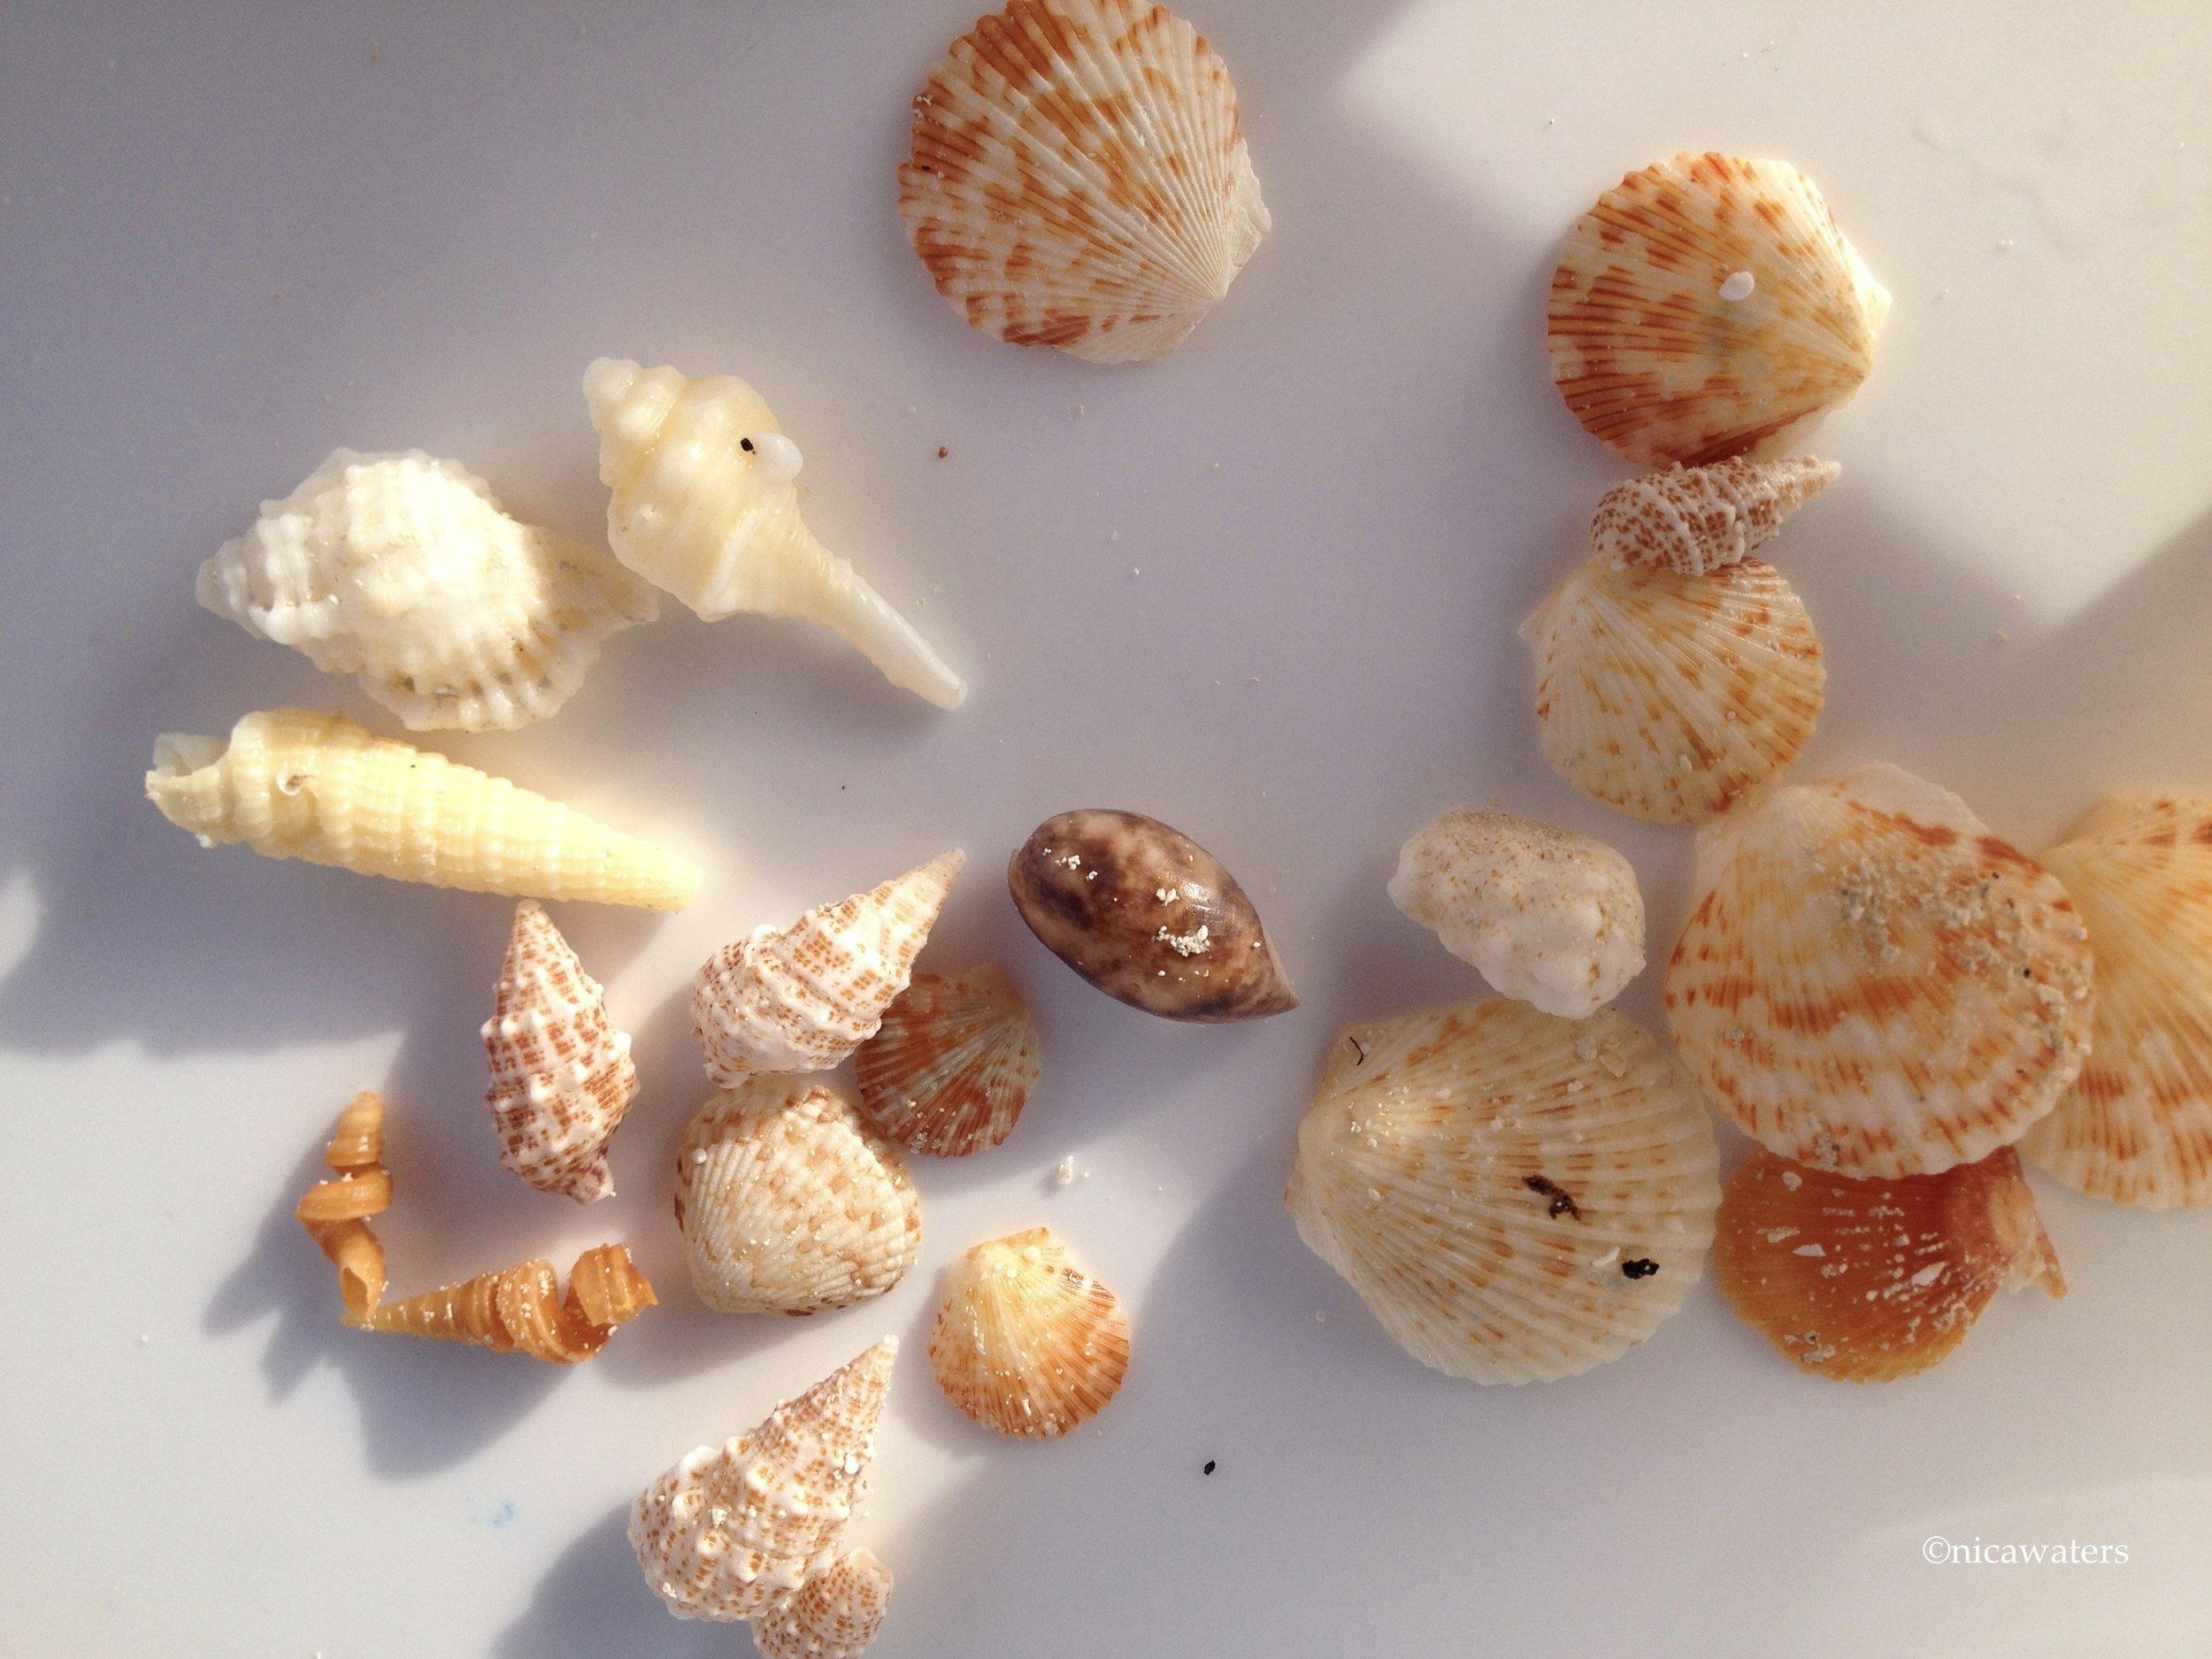 Some Bahamas shells